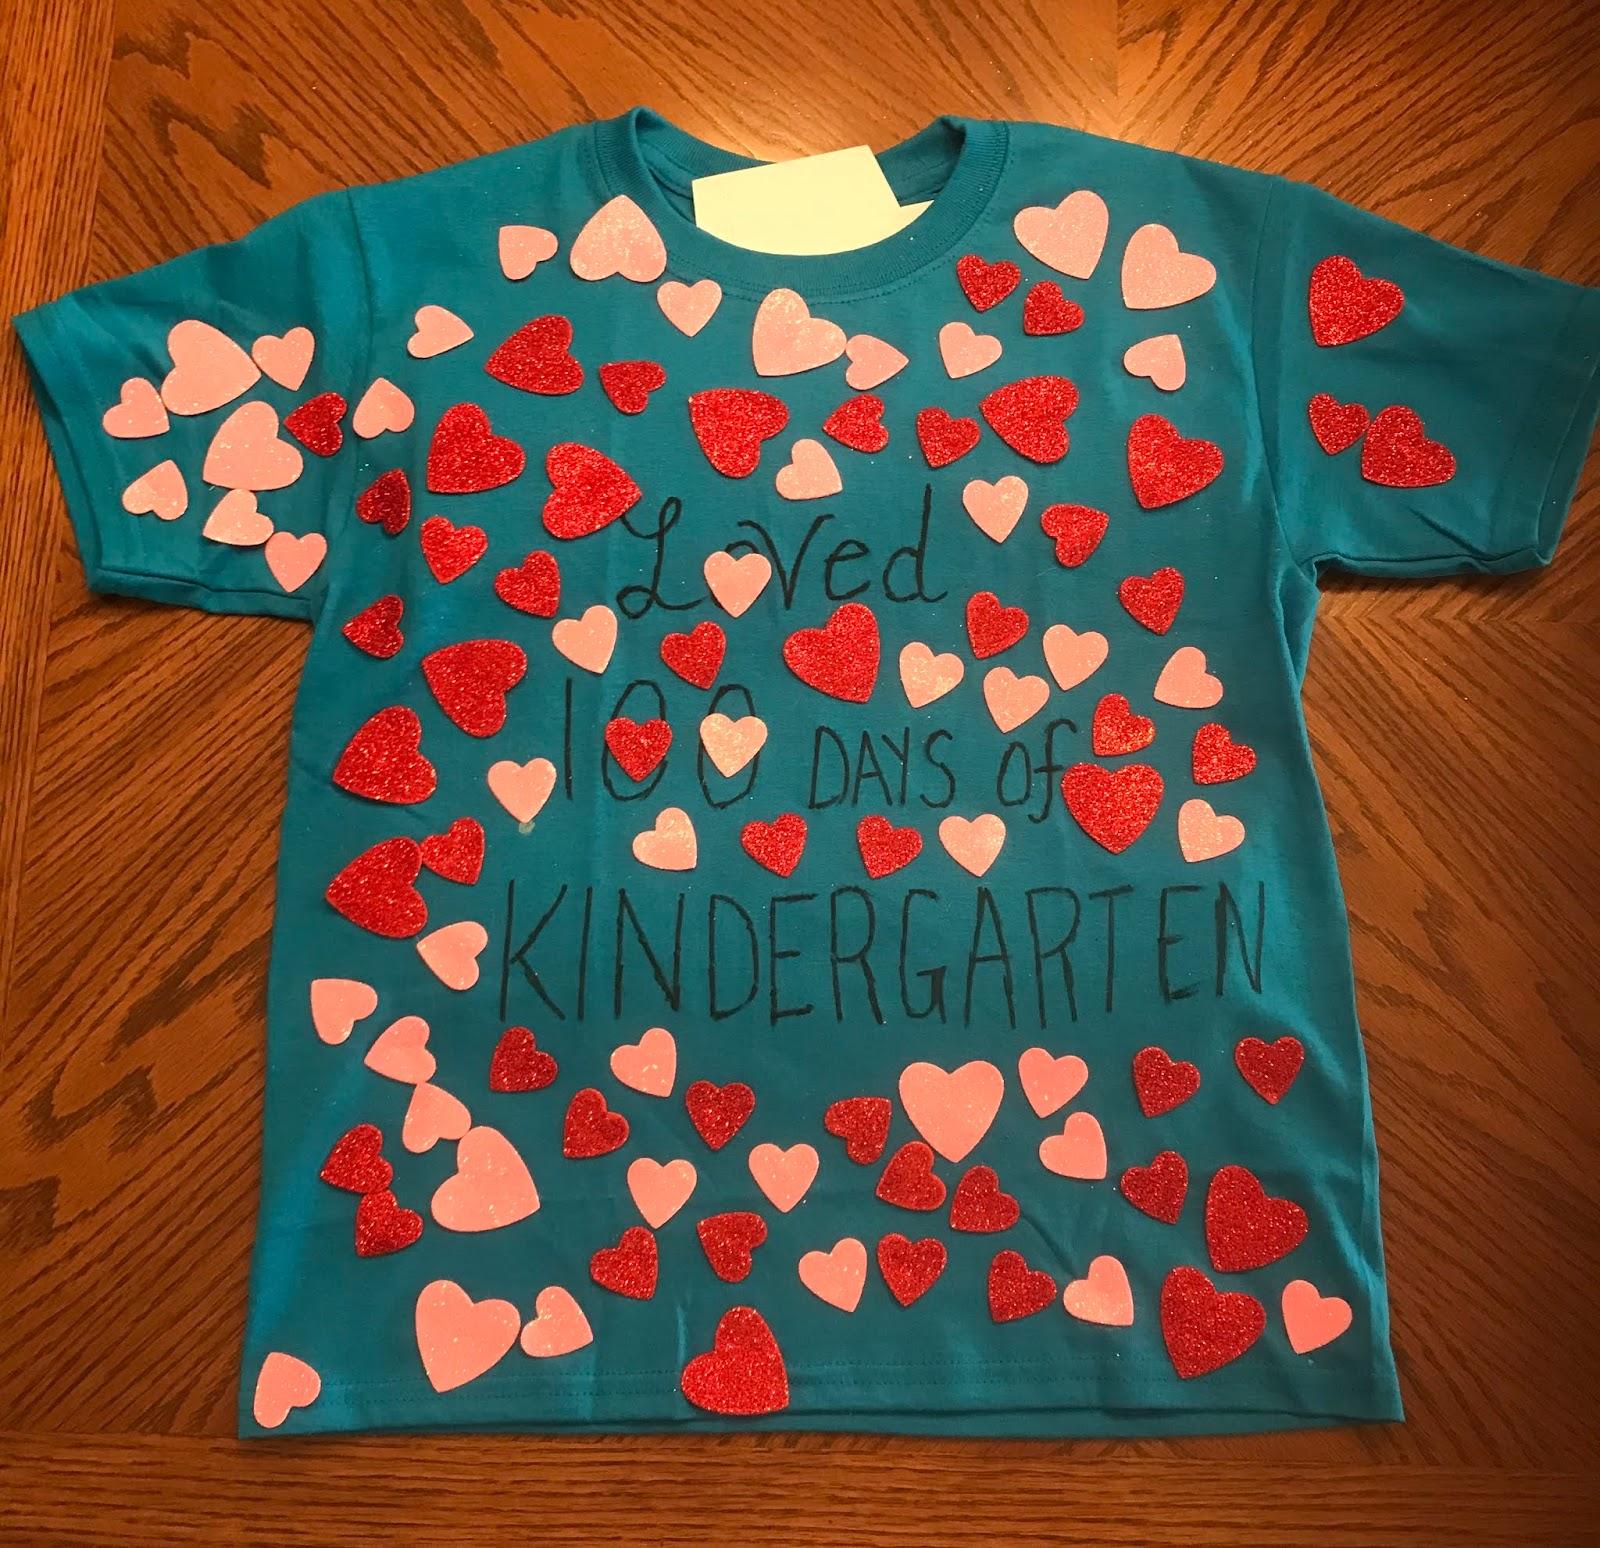 I've Loved 100 Days of School - Valentine's Themed 100 Days of School Shirt